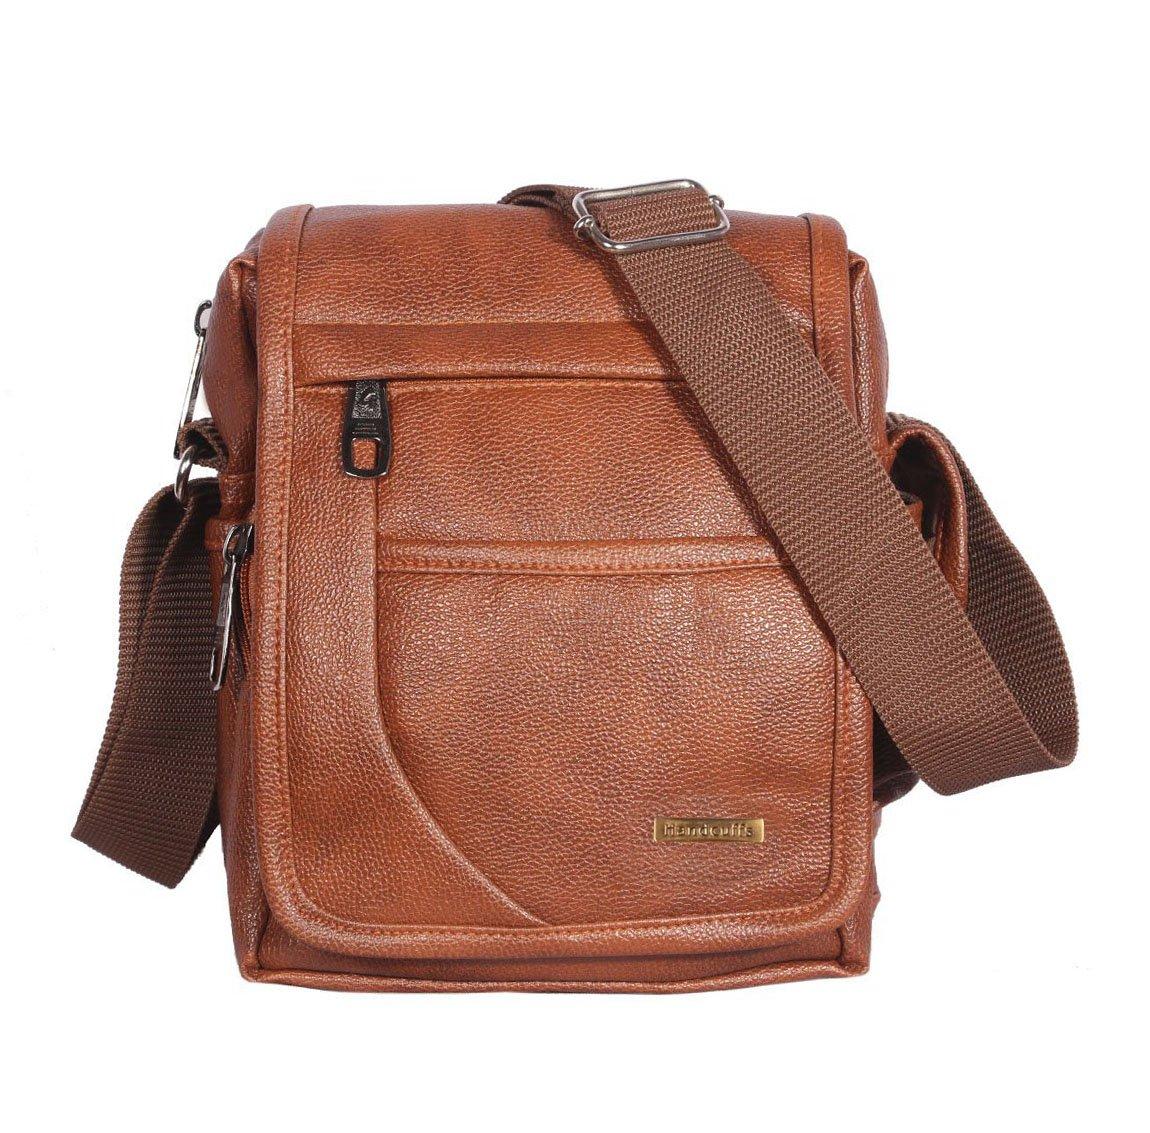 Handcuffs Mens Bag Messenger Bag Leather Shoulder Bags Travel Bag Crossbody Bags for Men Work Business - 10 Inch product image